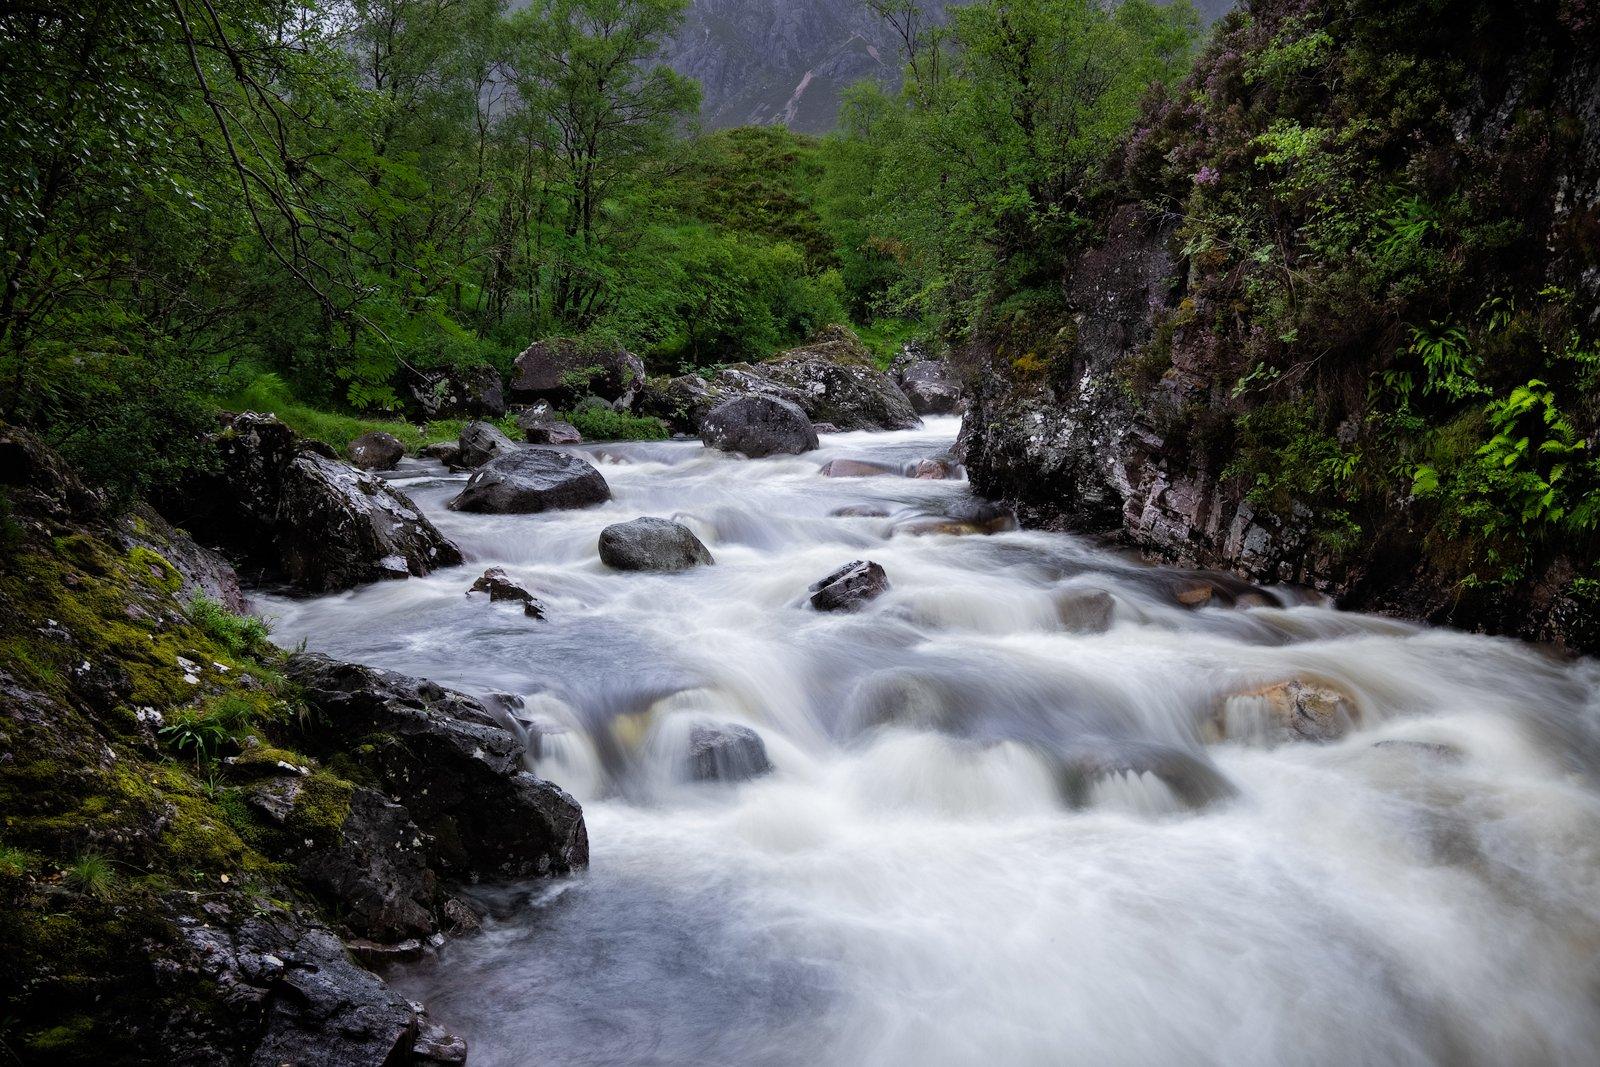 водопад, шотландия, гленко, etive mor, Александр Панфилов